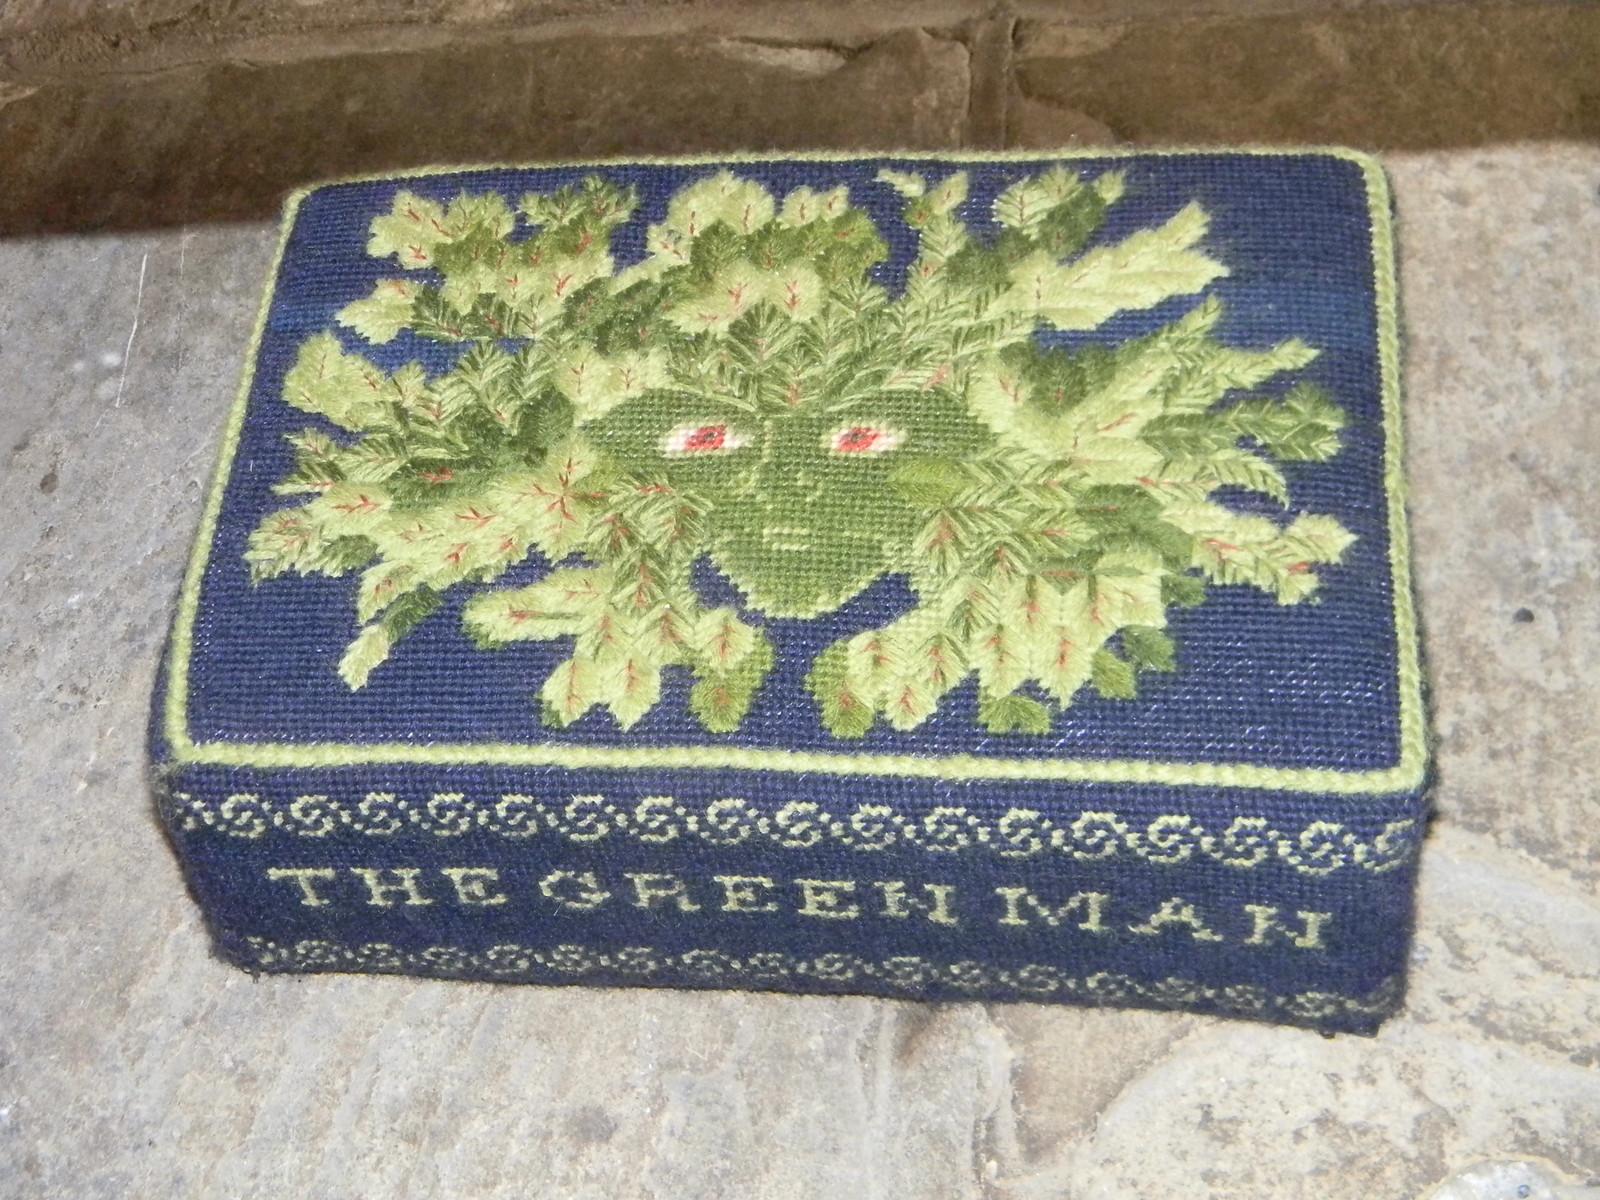 Green Man kneeler Shoreham Church Eynsford Circular